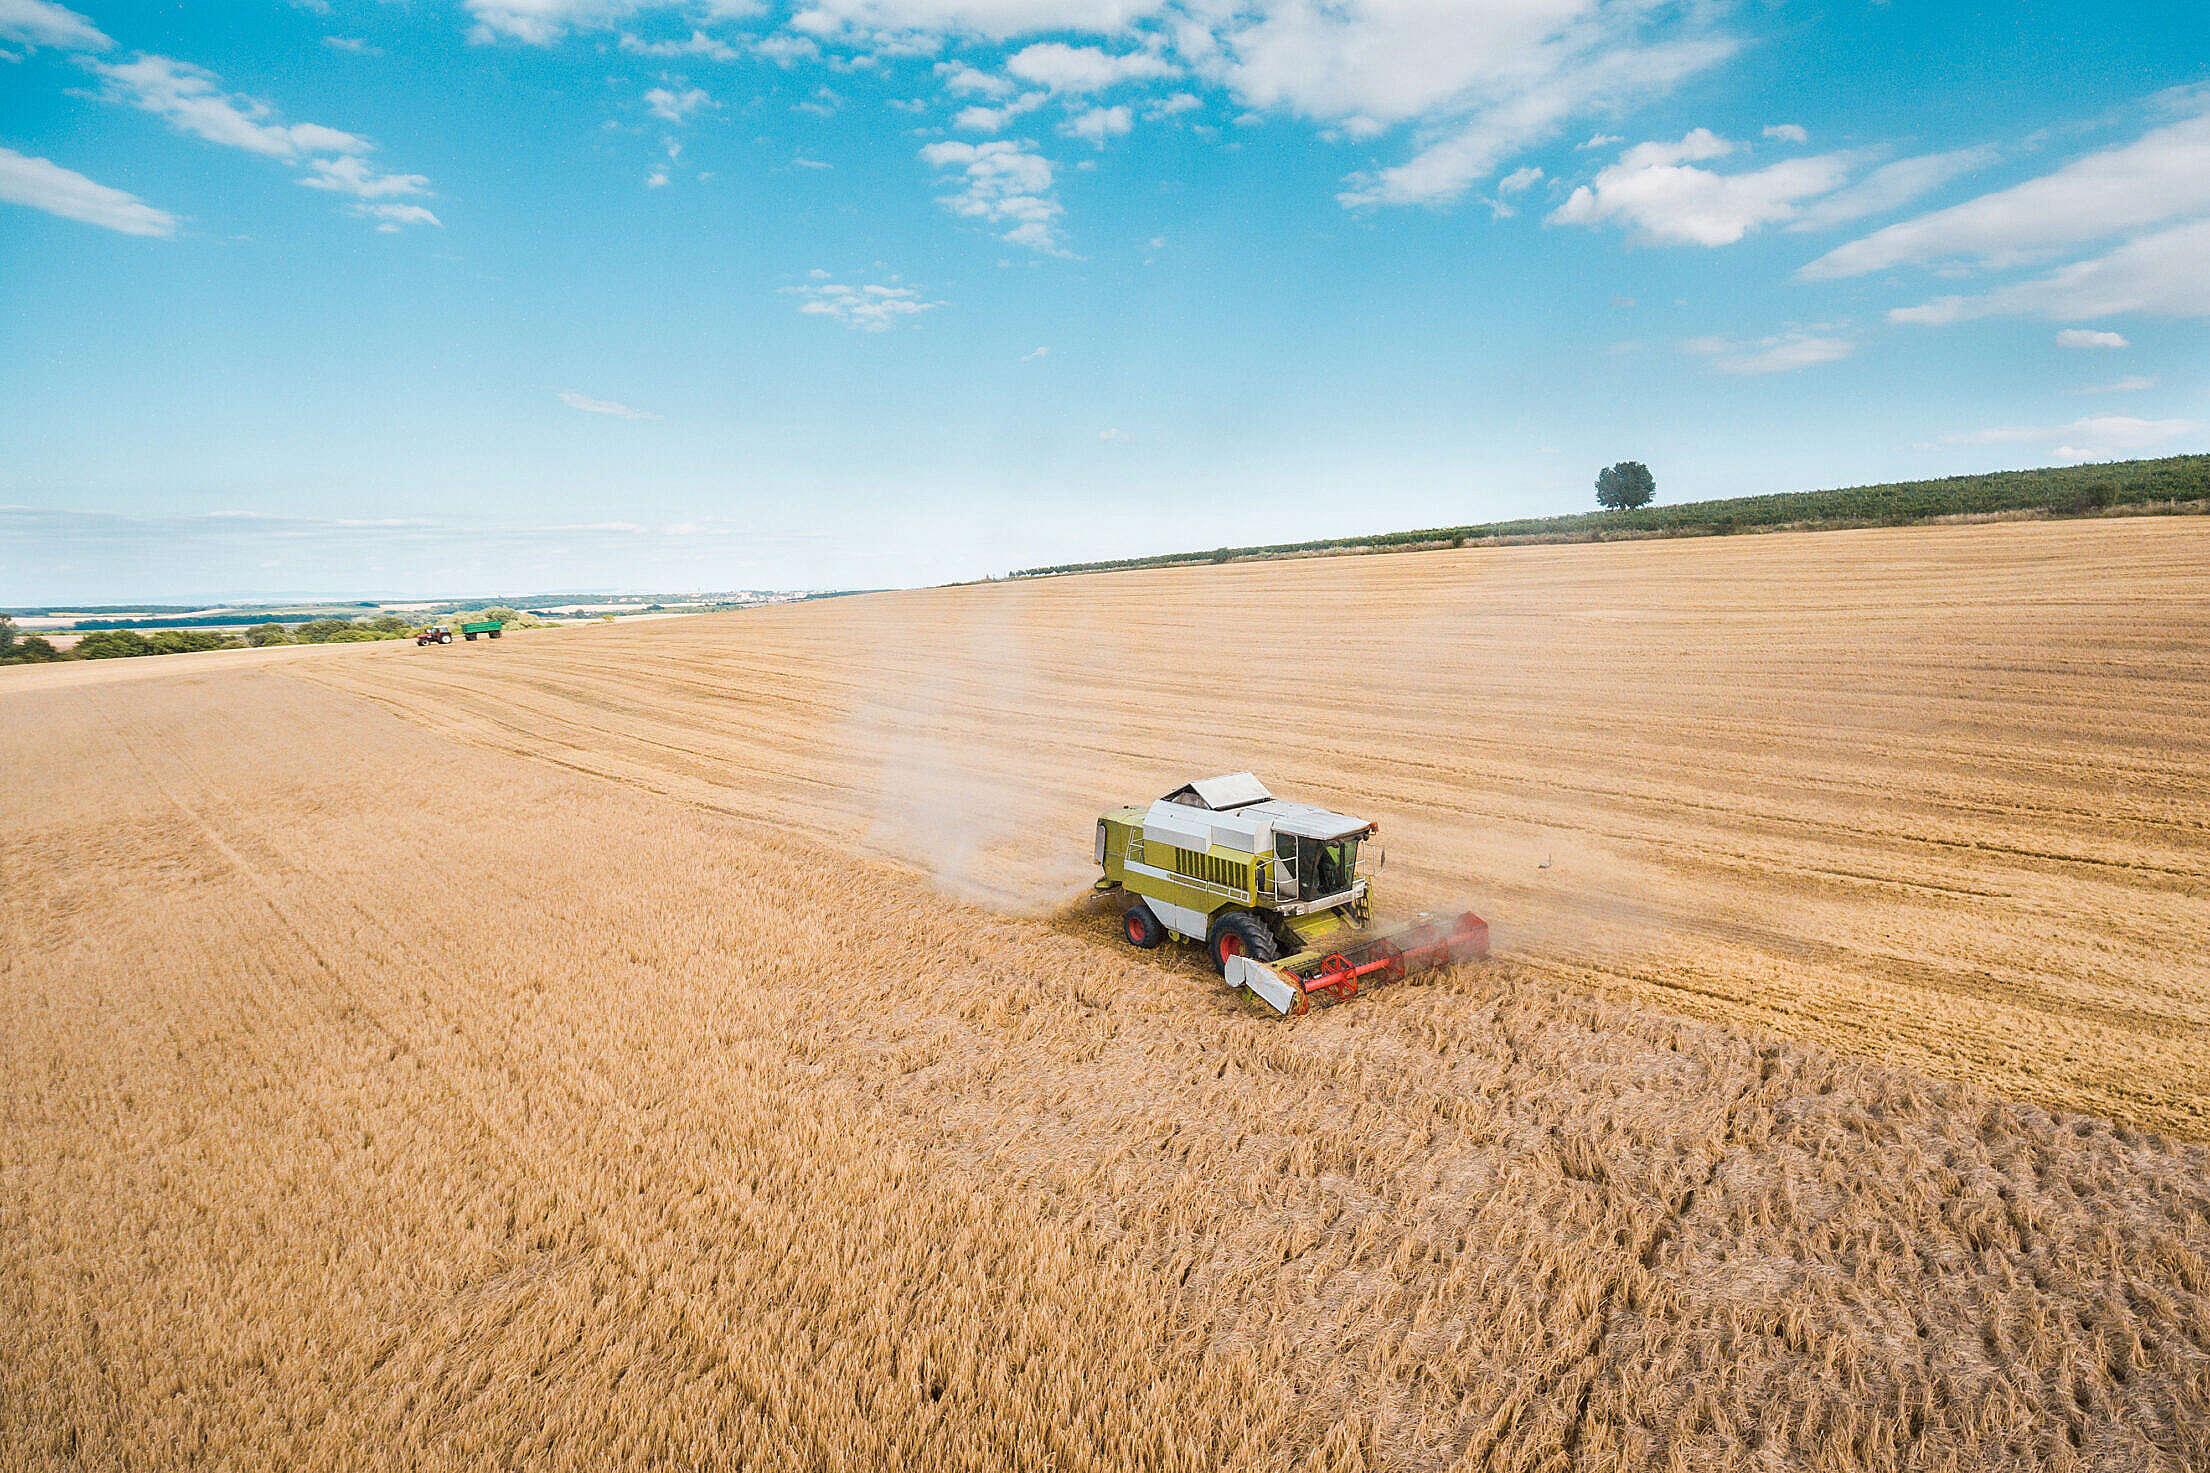 Combine Harvester Harvesting Wheat Crops Free Stock Photo